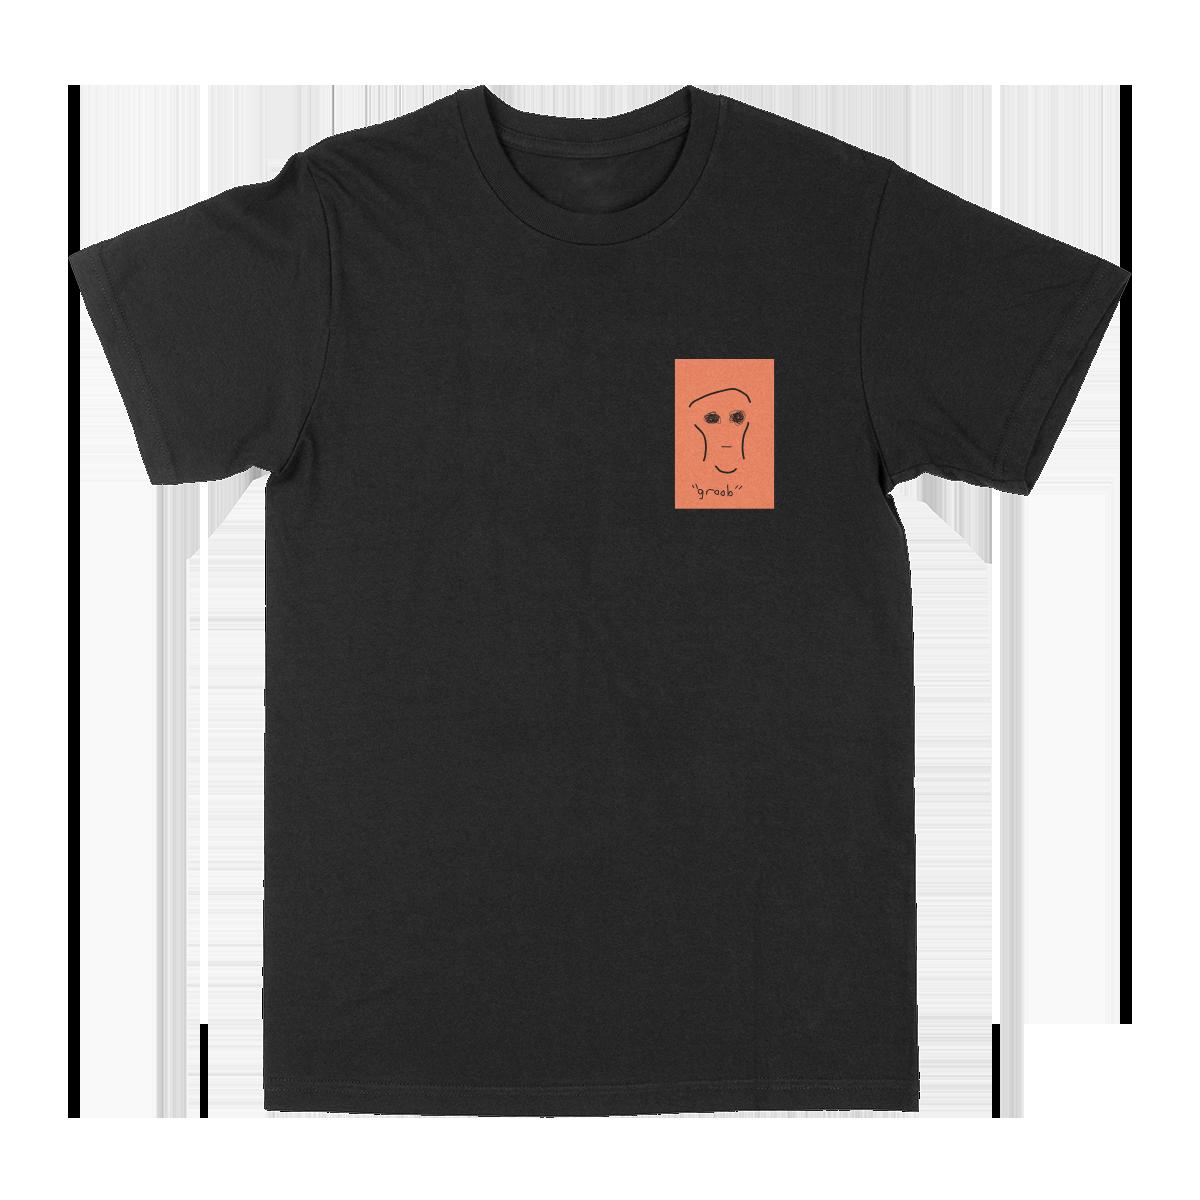 groob shirt